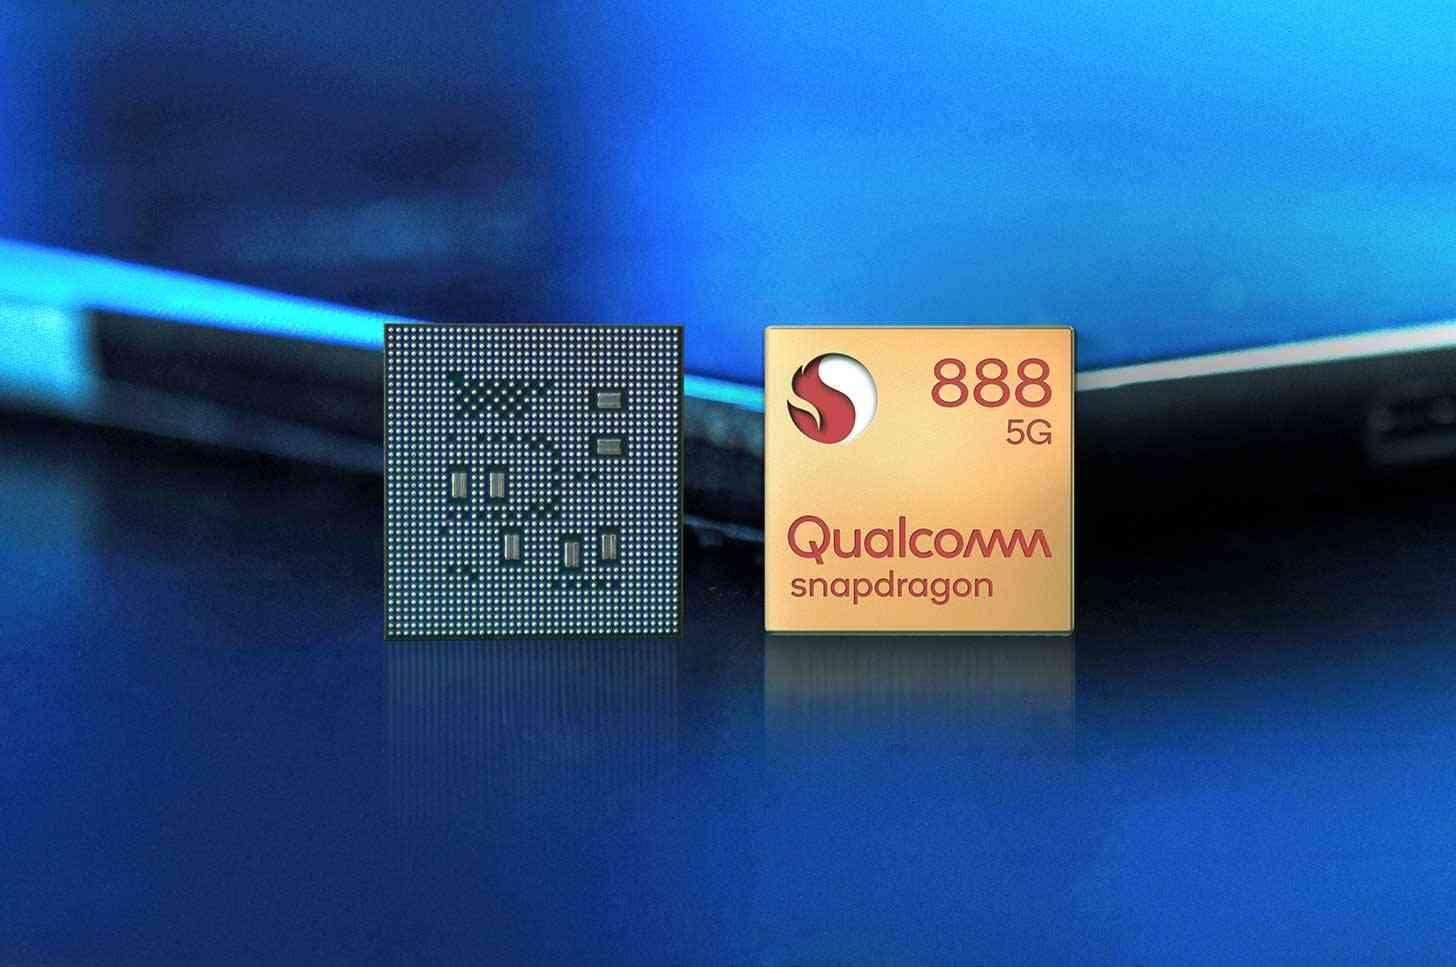 Snapdragon 888 processor official